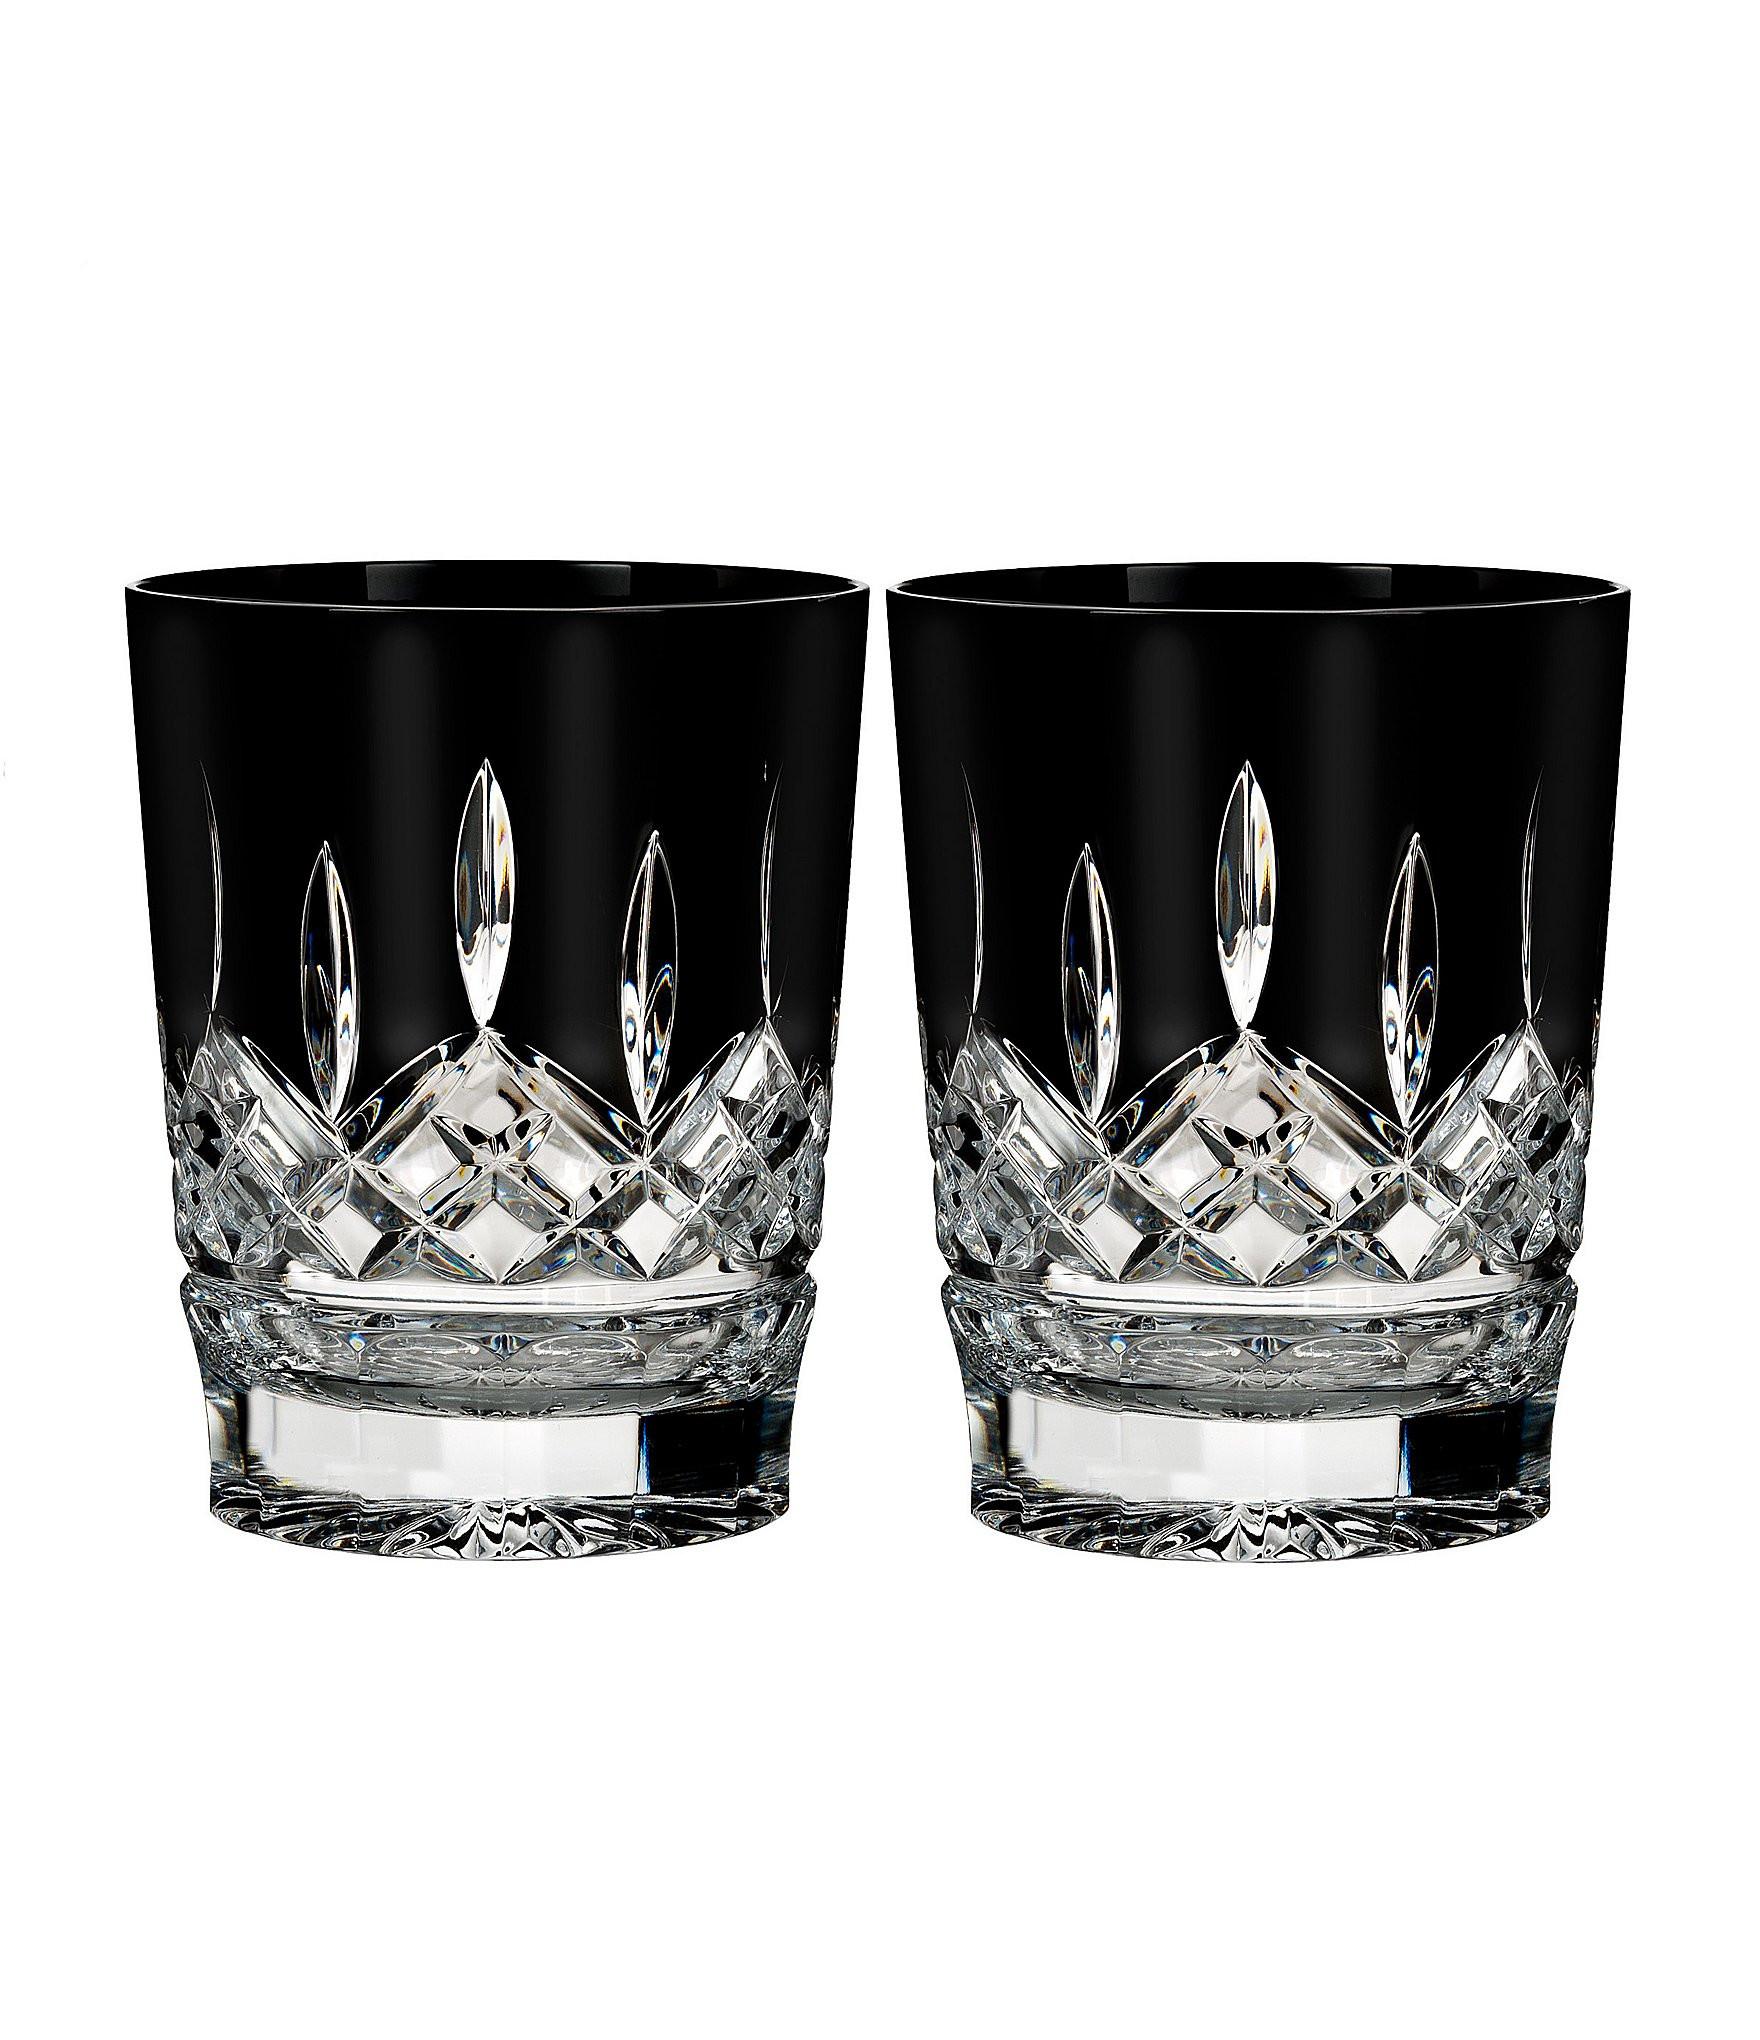 waterford giftology lismore sugar bud vase of waterford crystal lismore home kitchen dining bedding dillards inside 04998418 zi black